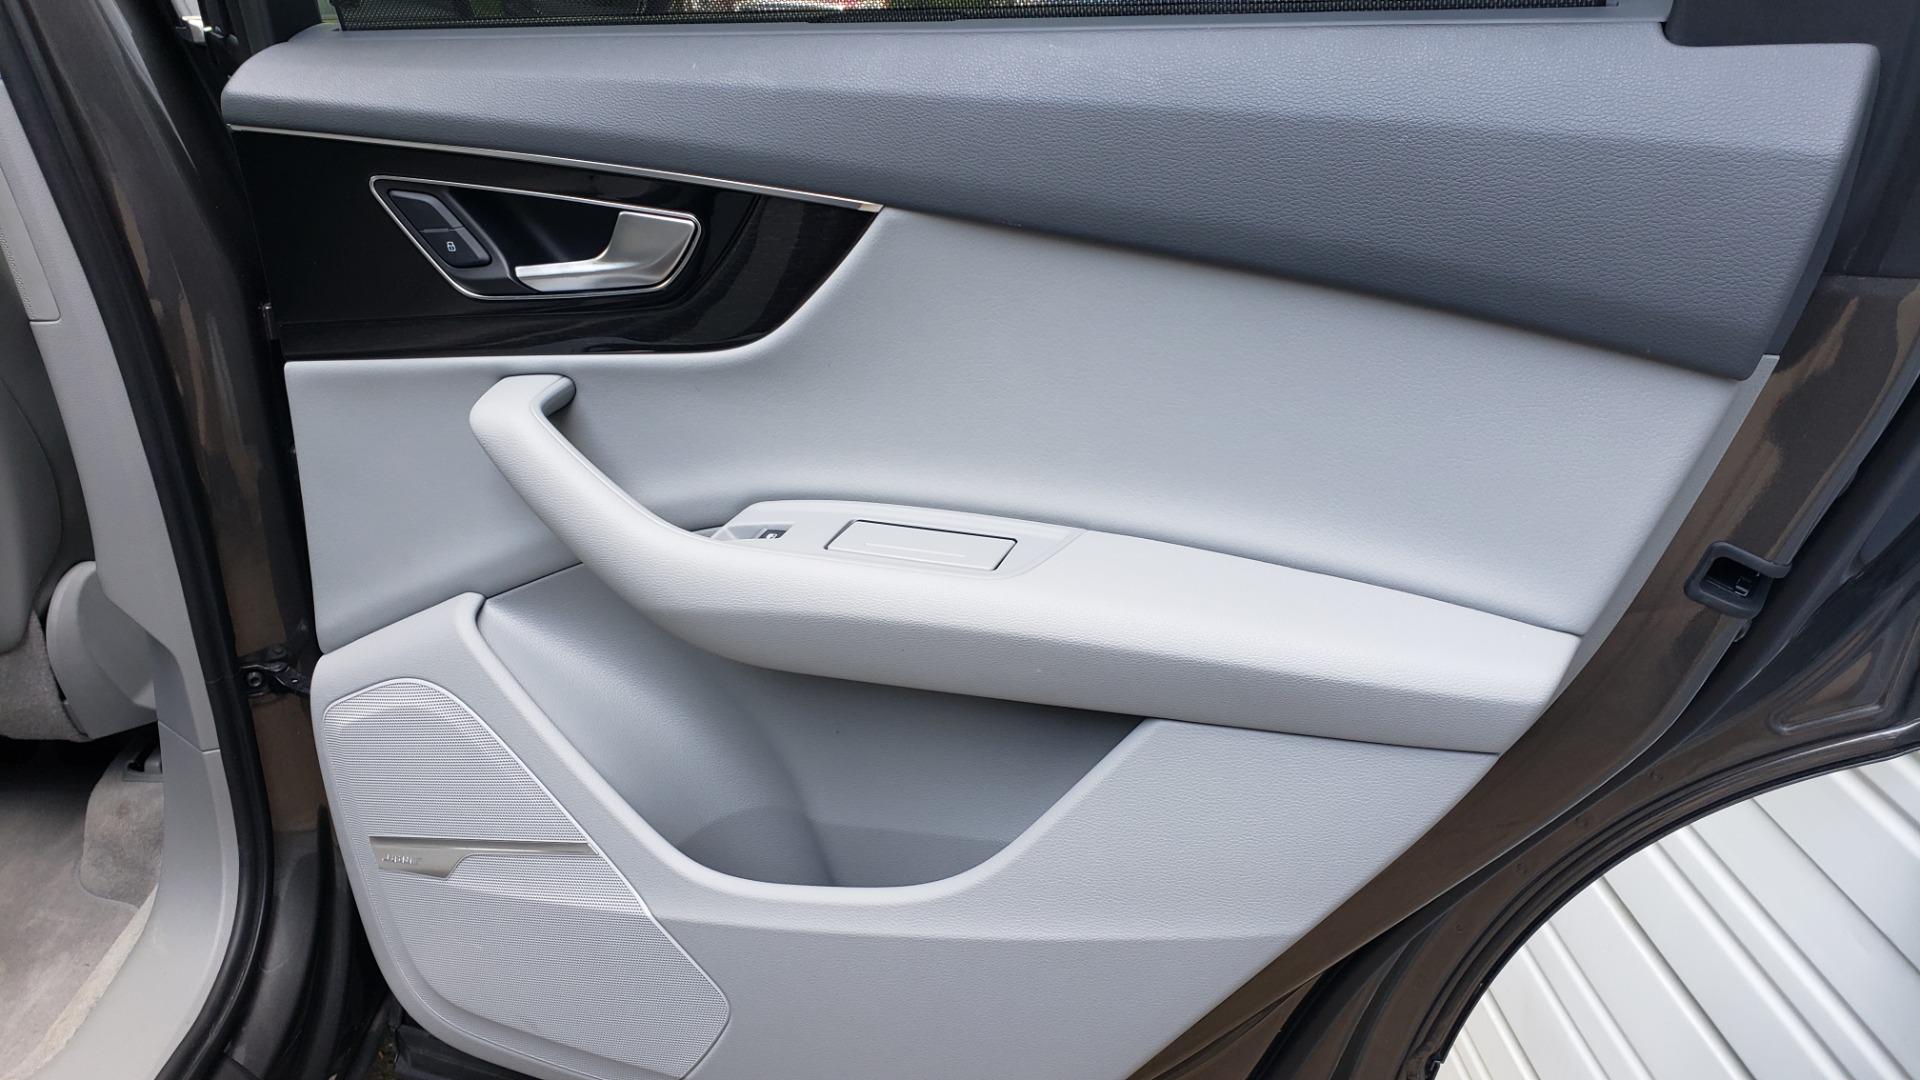 Used 2018 Audi Q7 PRESTIGE TIPTRONIC / NAV / SUNROOF / ADAPTIVE PKG / DRVR ASST / CLD WTHR /  for sale $49,995 at Formula Imports in Charlotte NC 28227 75